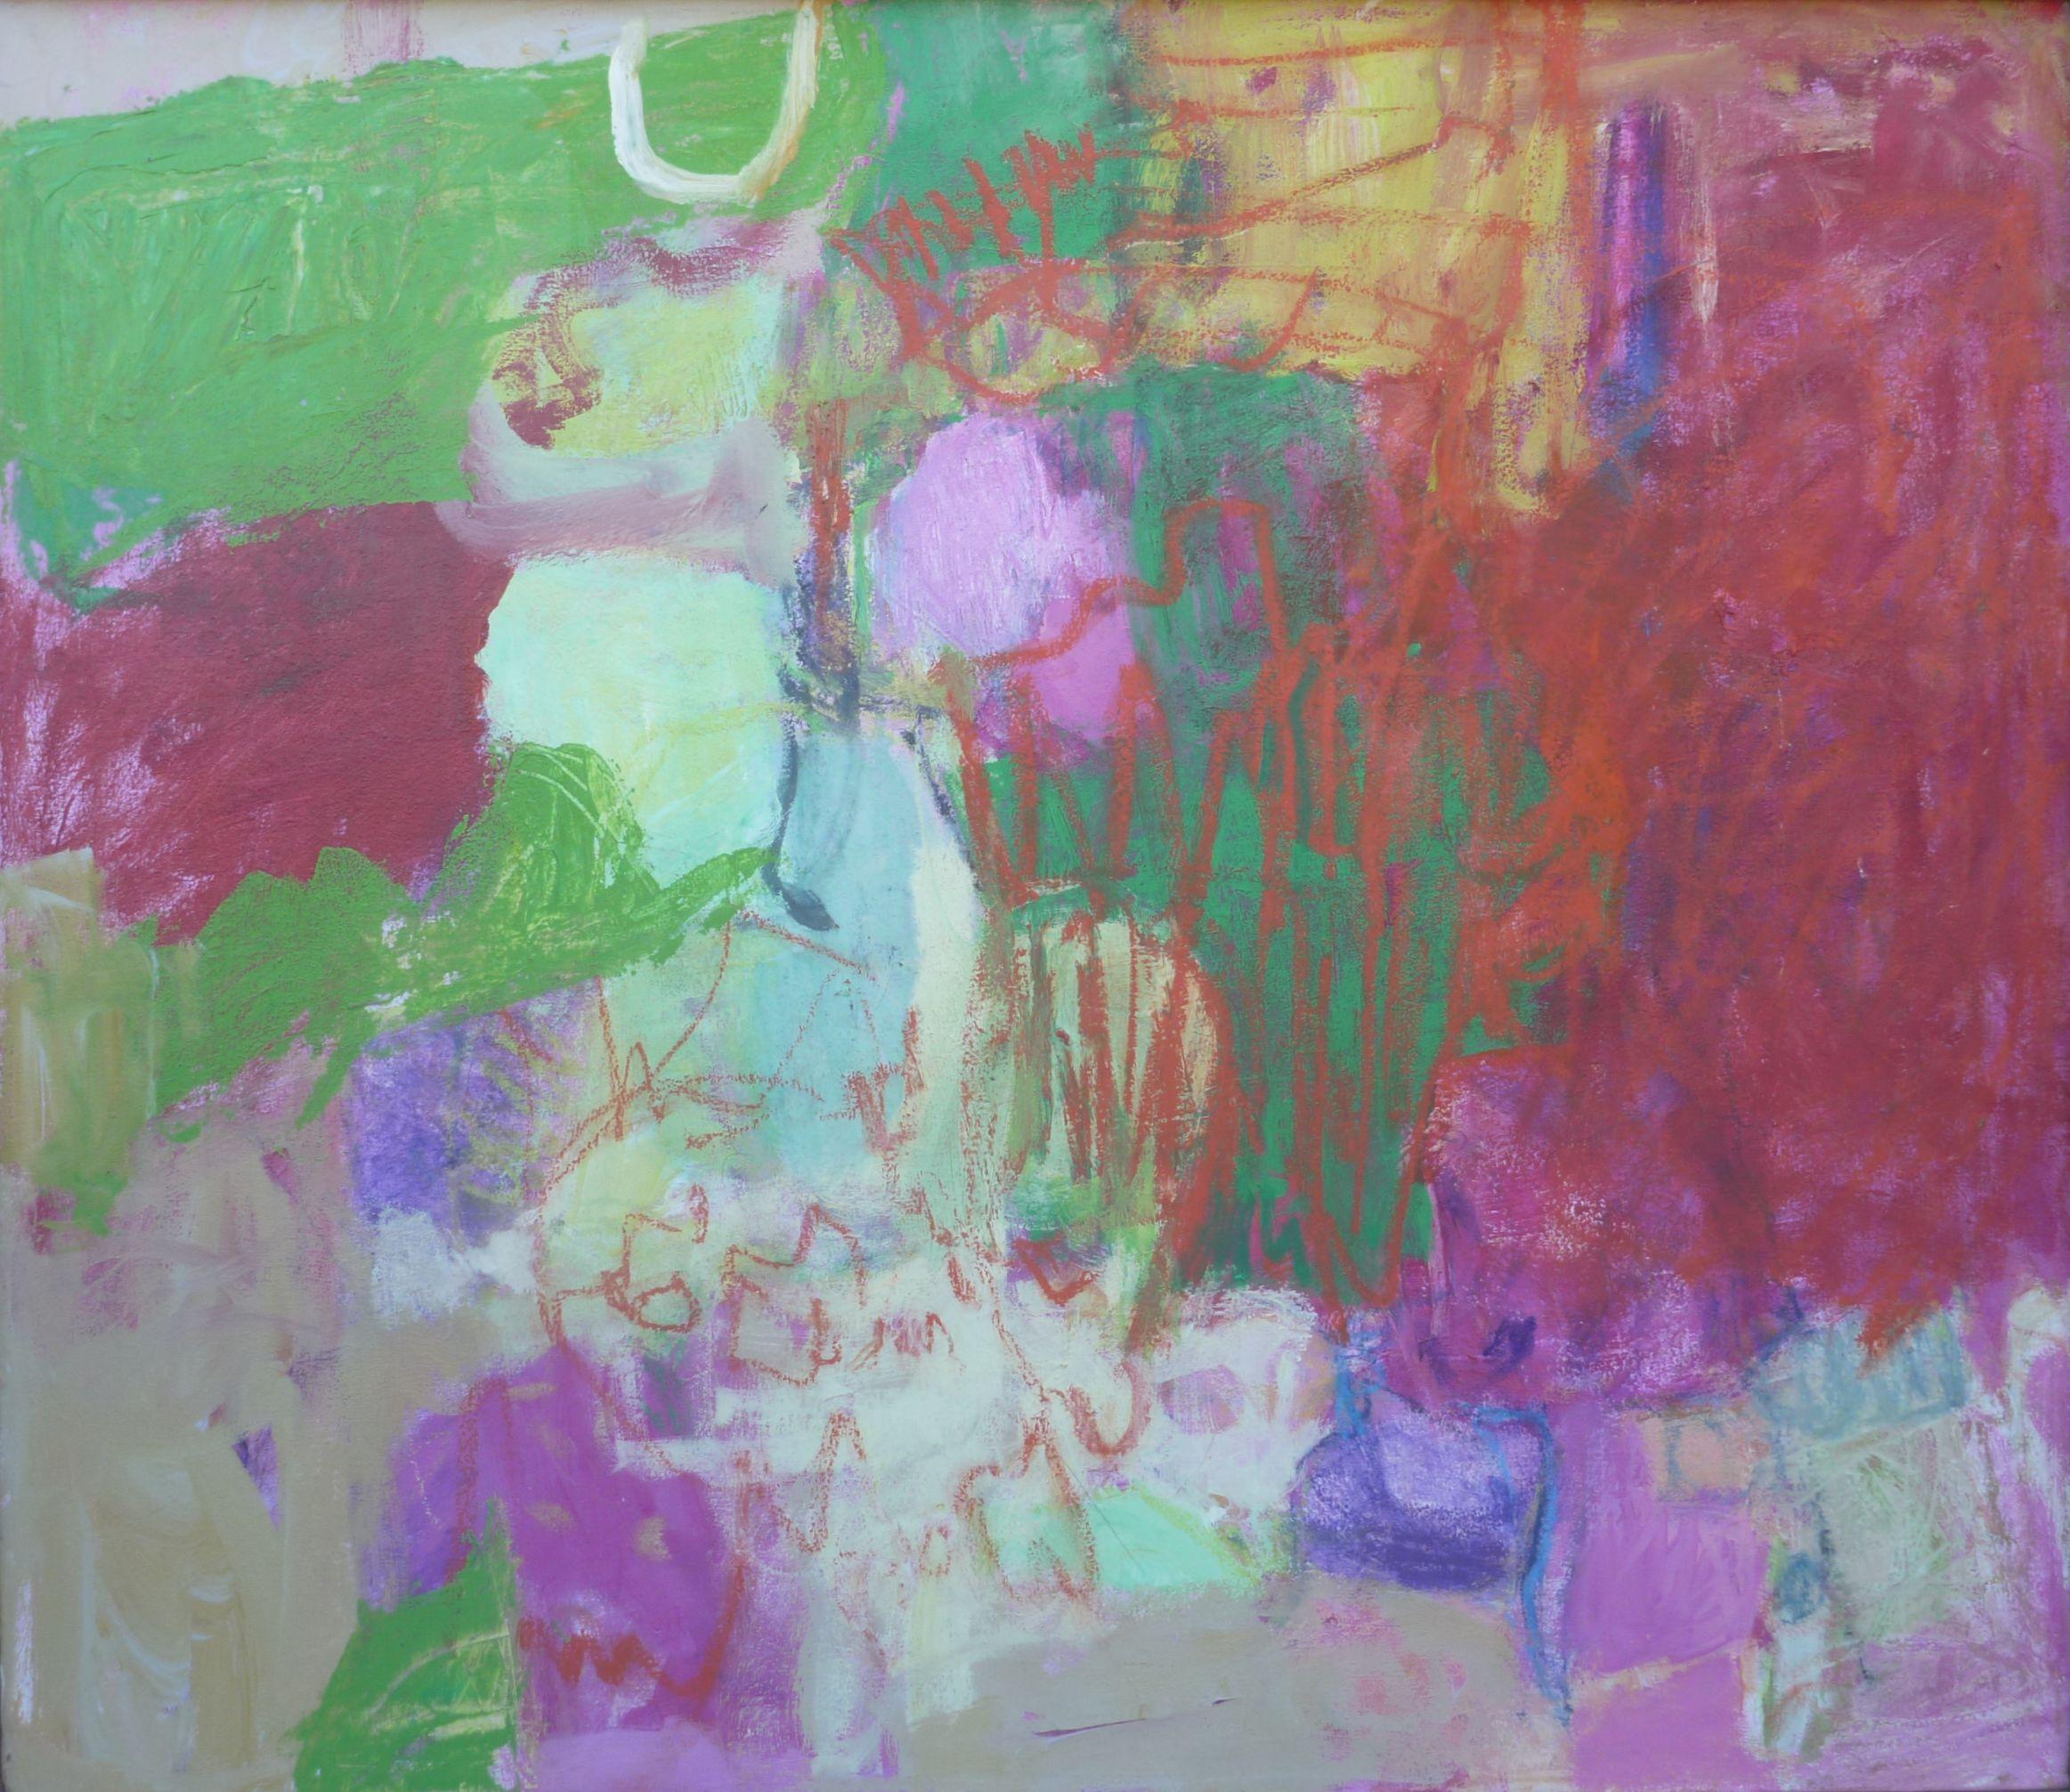 fumiko kashiwagi no title 30x26 acrylic oil pastel on canvas